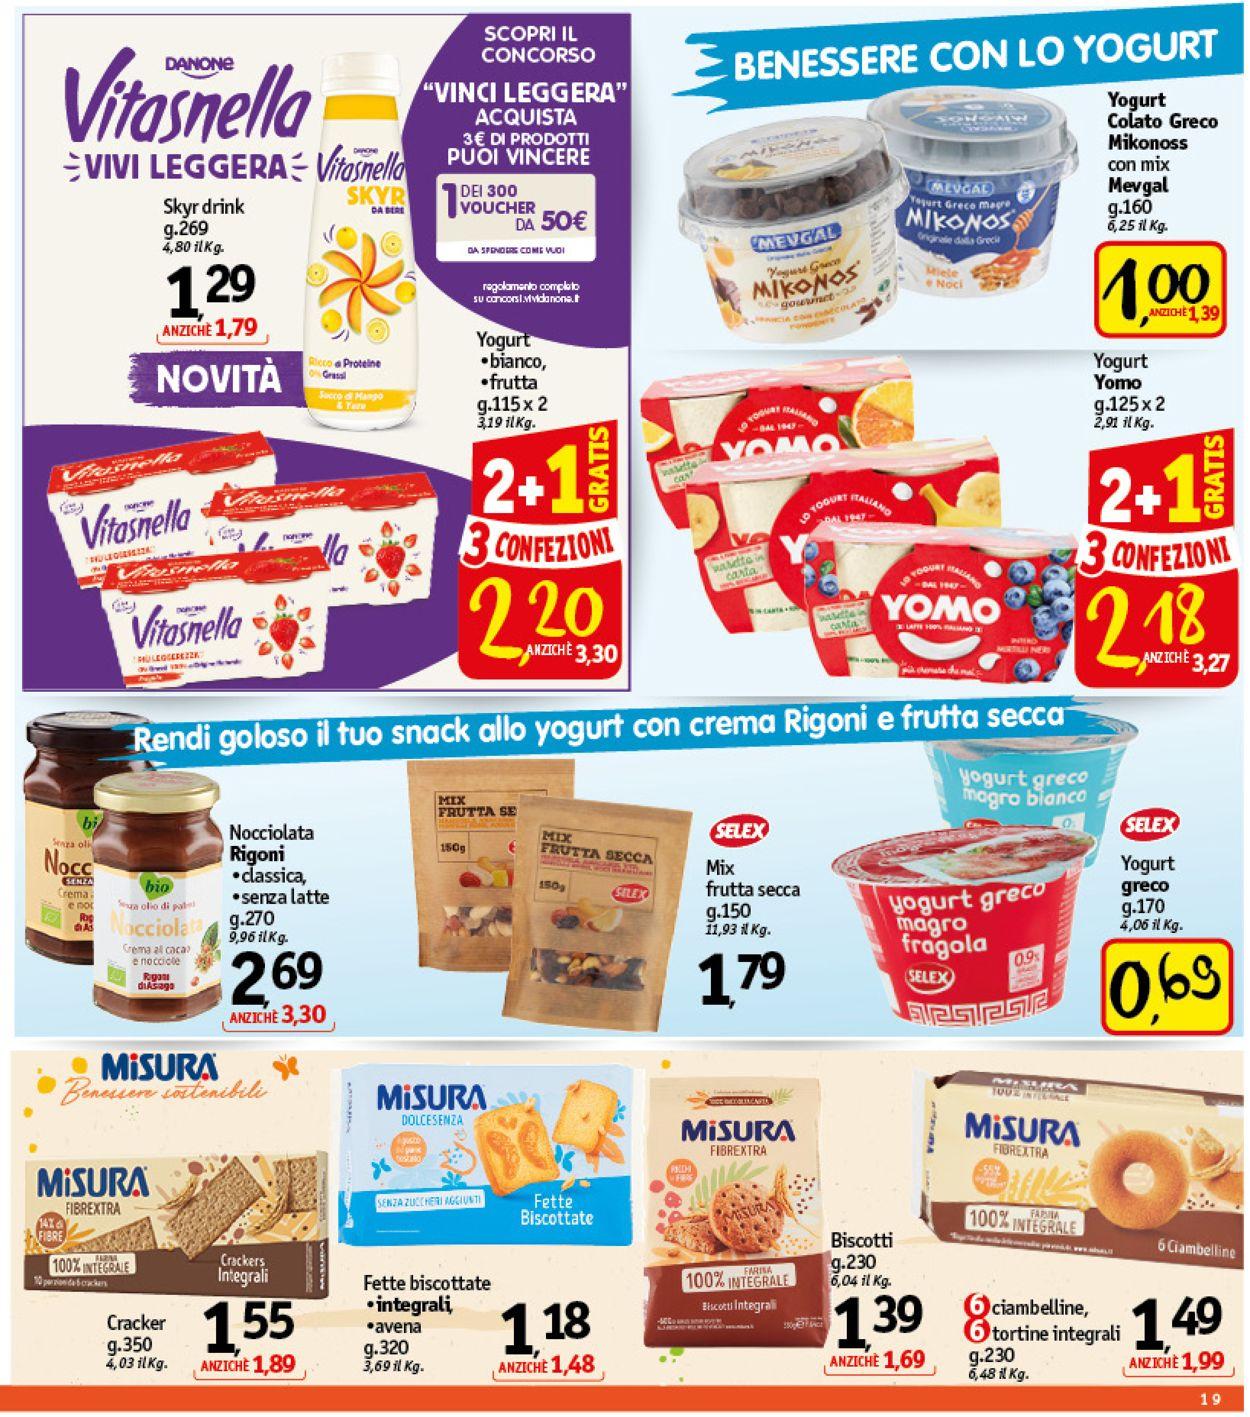 Volantino Famila - Offerte 01/07-10/07/2021 (Pagina 19)